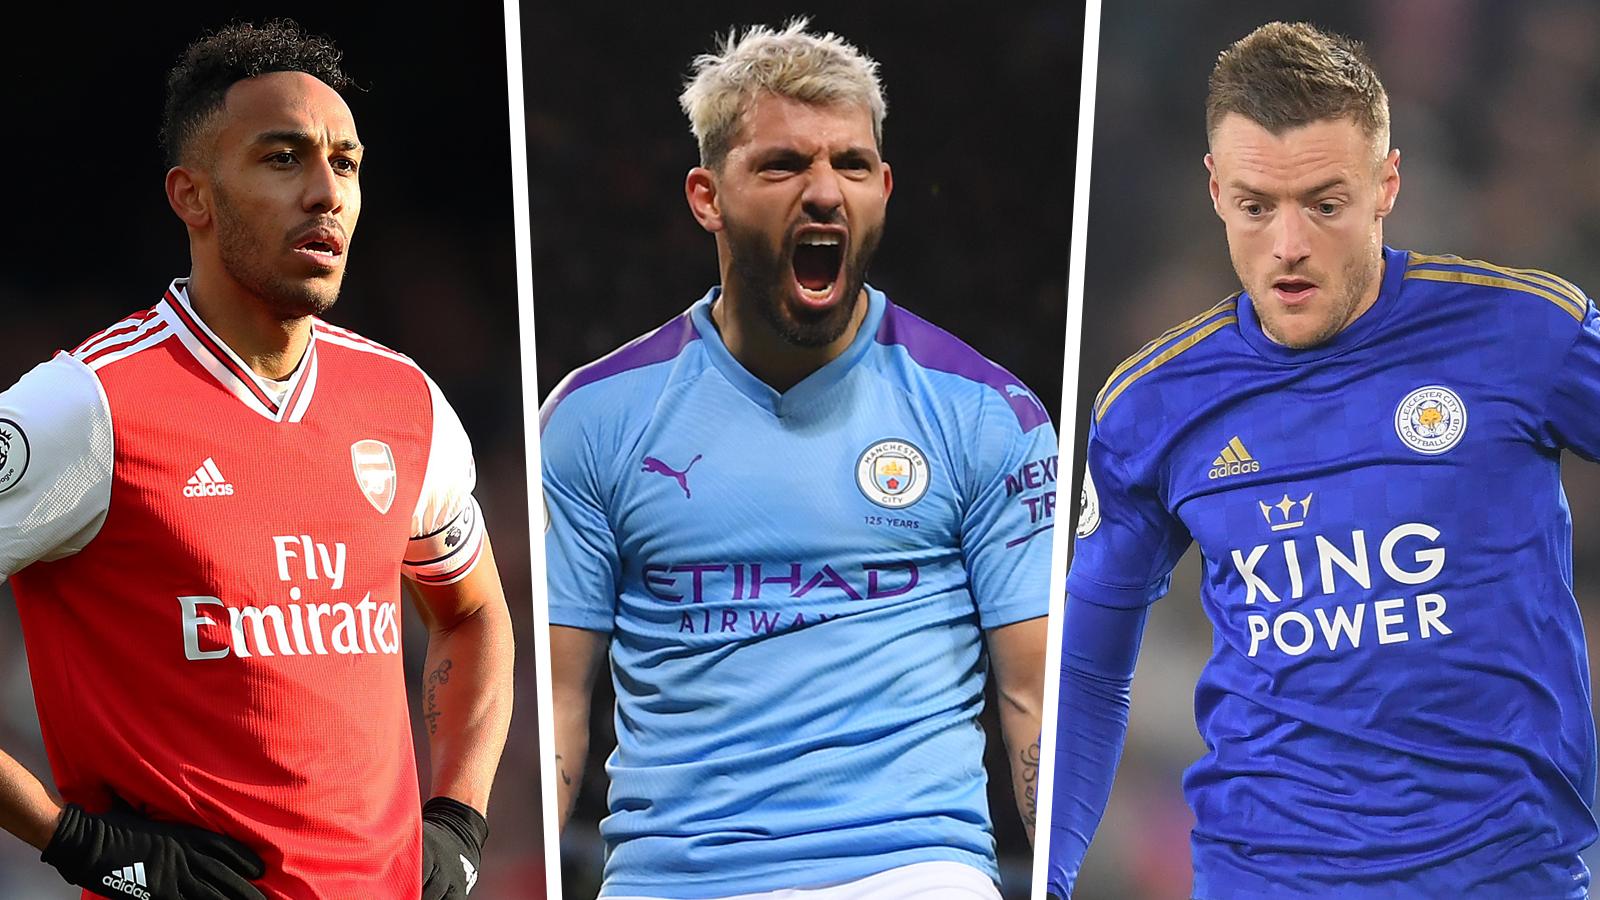 Premier League top scorers 2019-20: Vardy, Ings, Salah & Aubameyang lead  the race